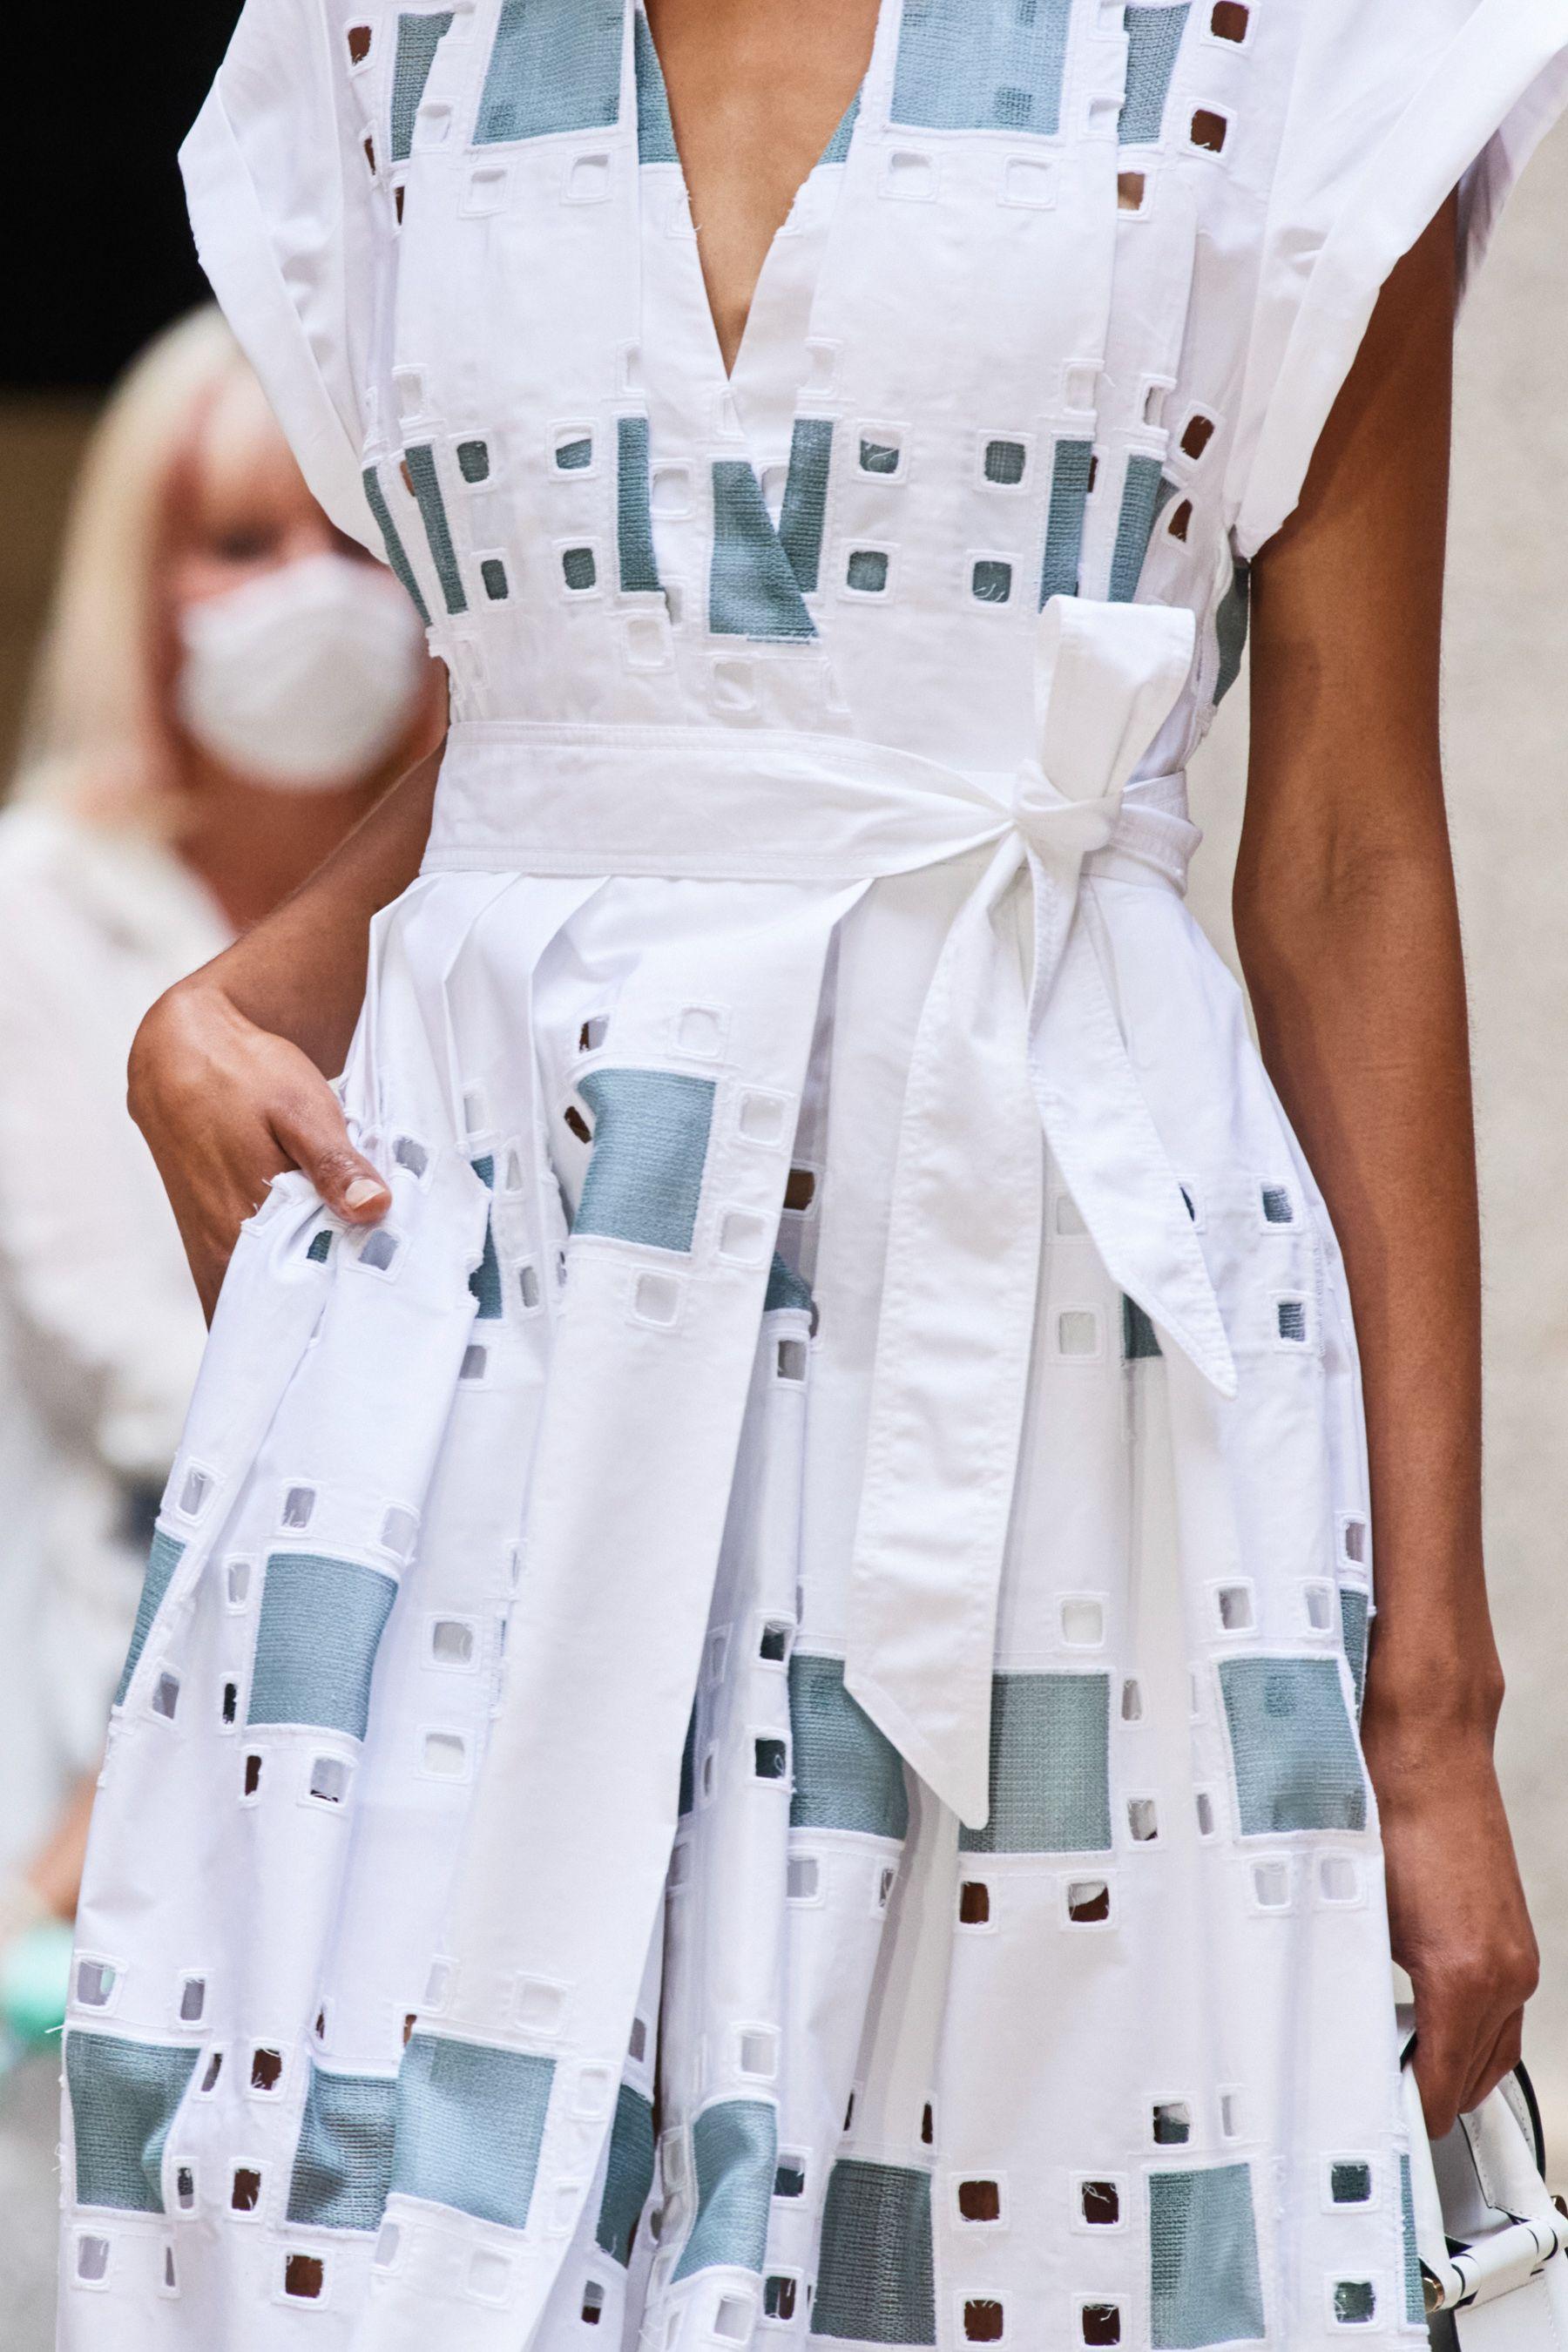 Mario Dice Spring 2021 Fashion Show Details   The